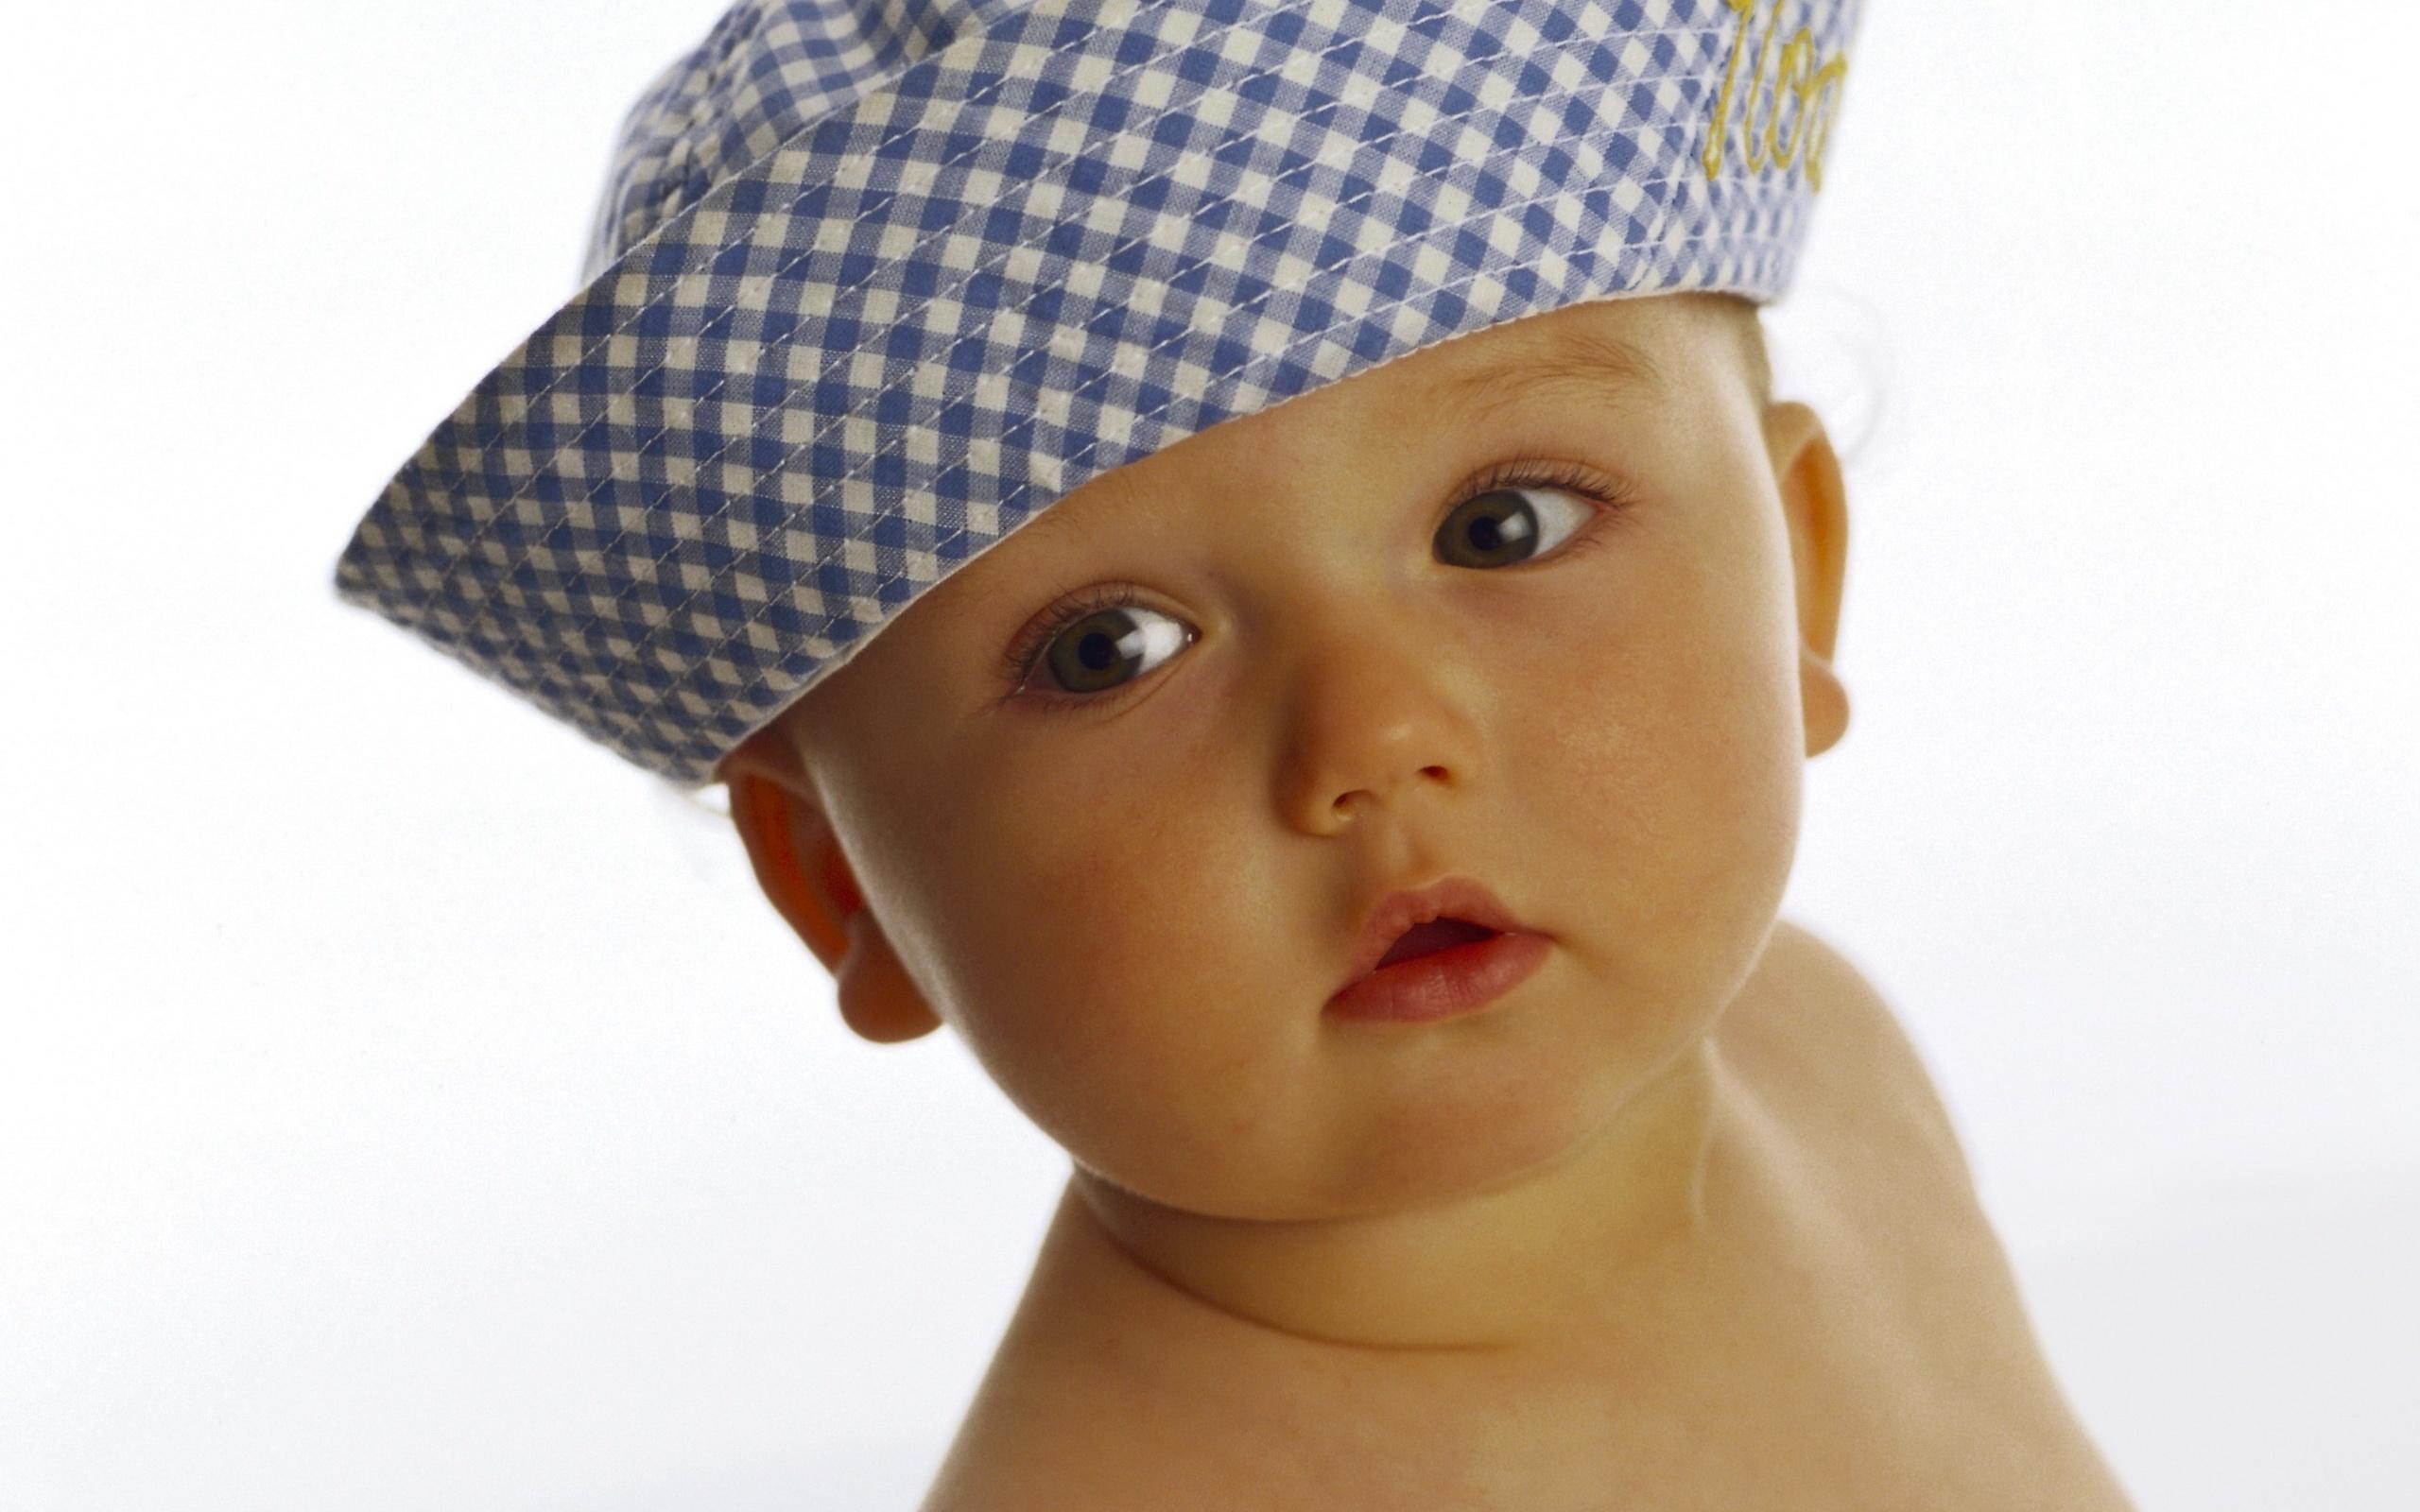 Фото ребенка на разных фонах